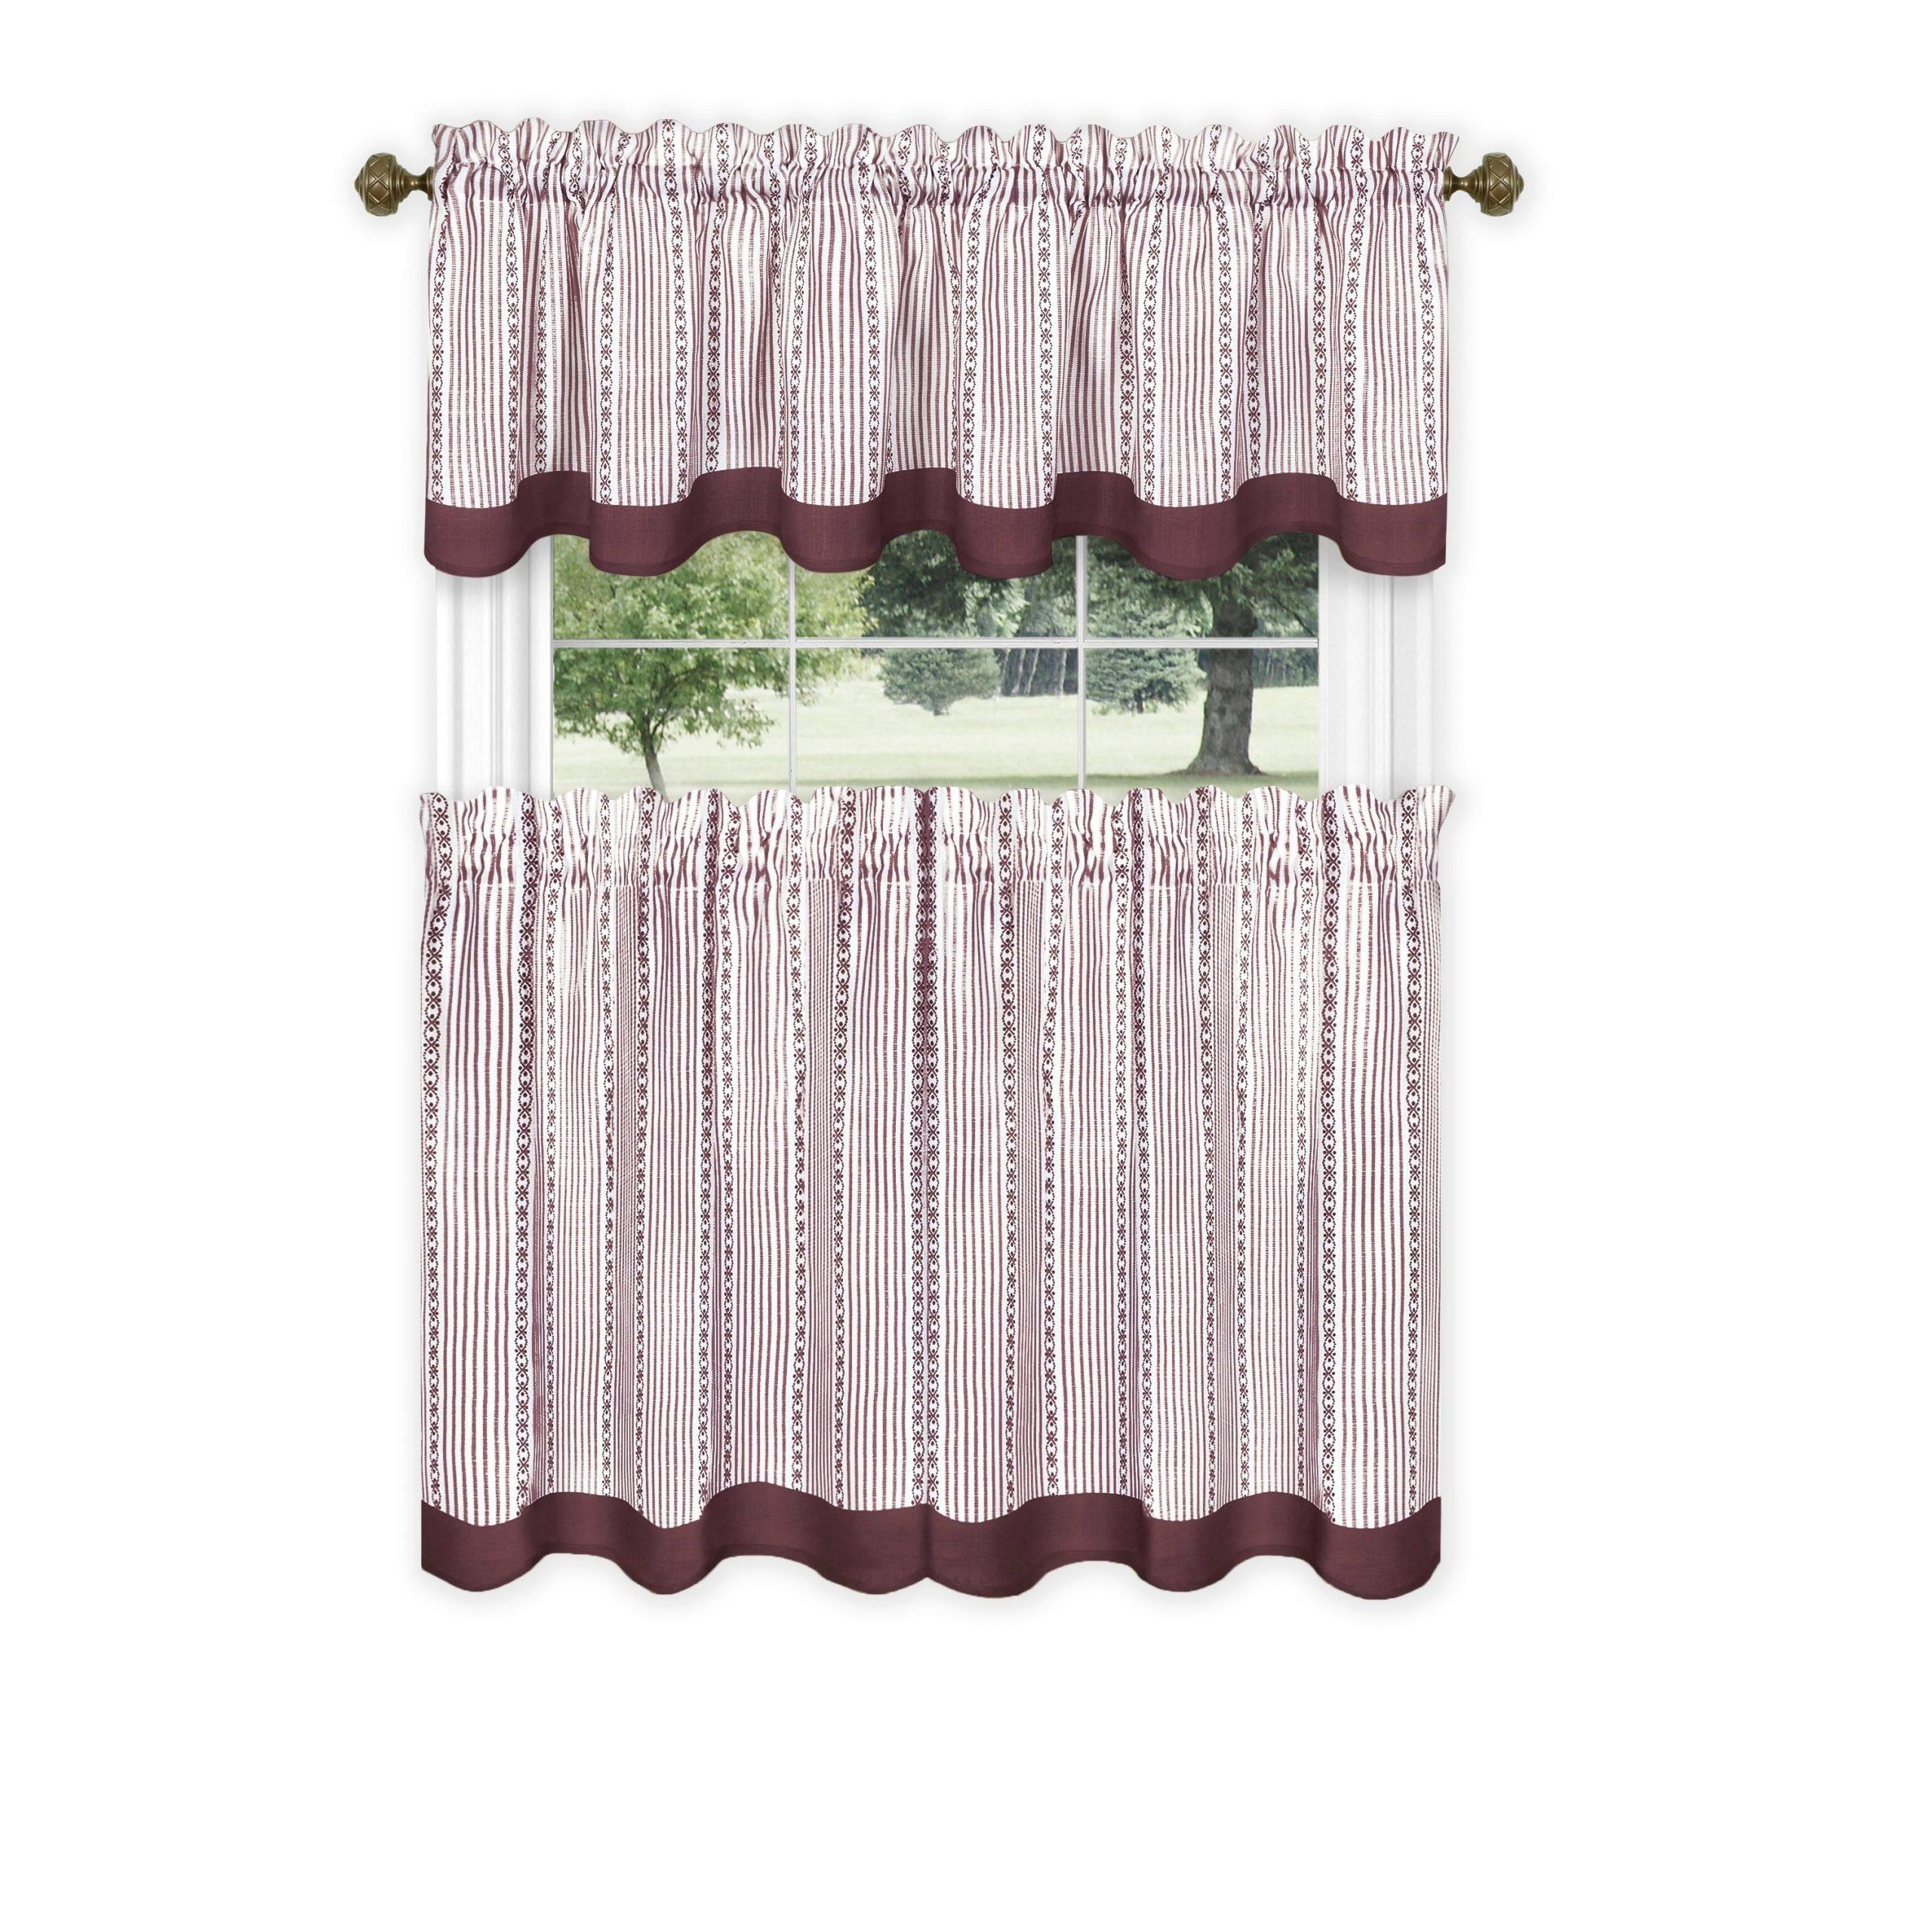 Achim Westport Window Curtain Tier Pair And Valance Set With Regard To Most Recent Window Curtain Tier And Valance Sets (View 18 of 20)